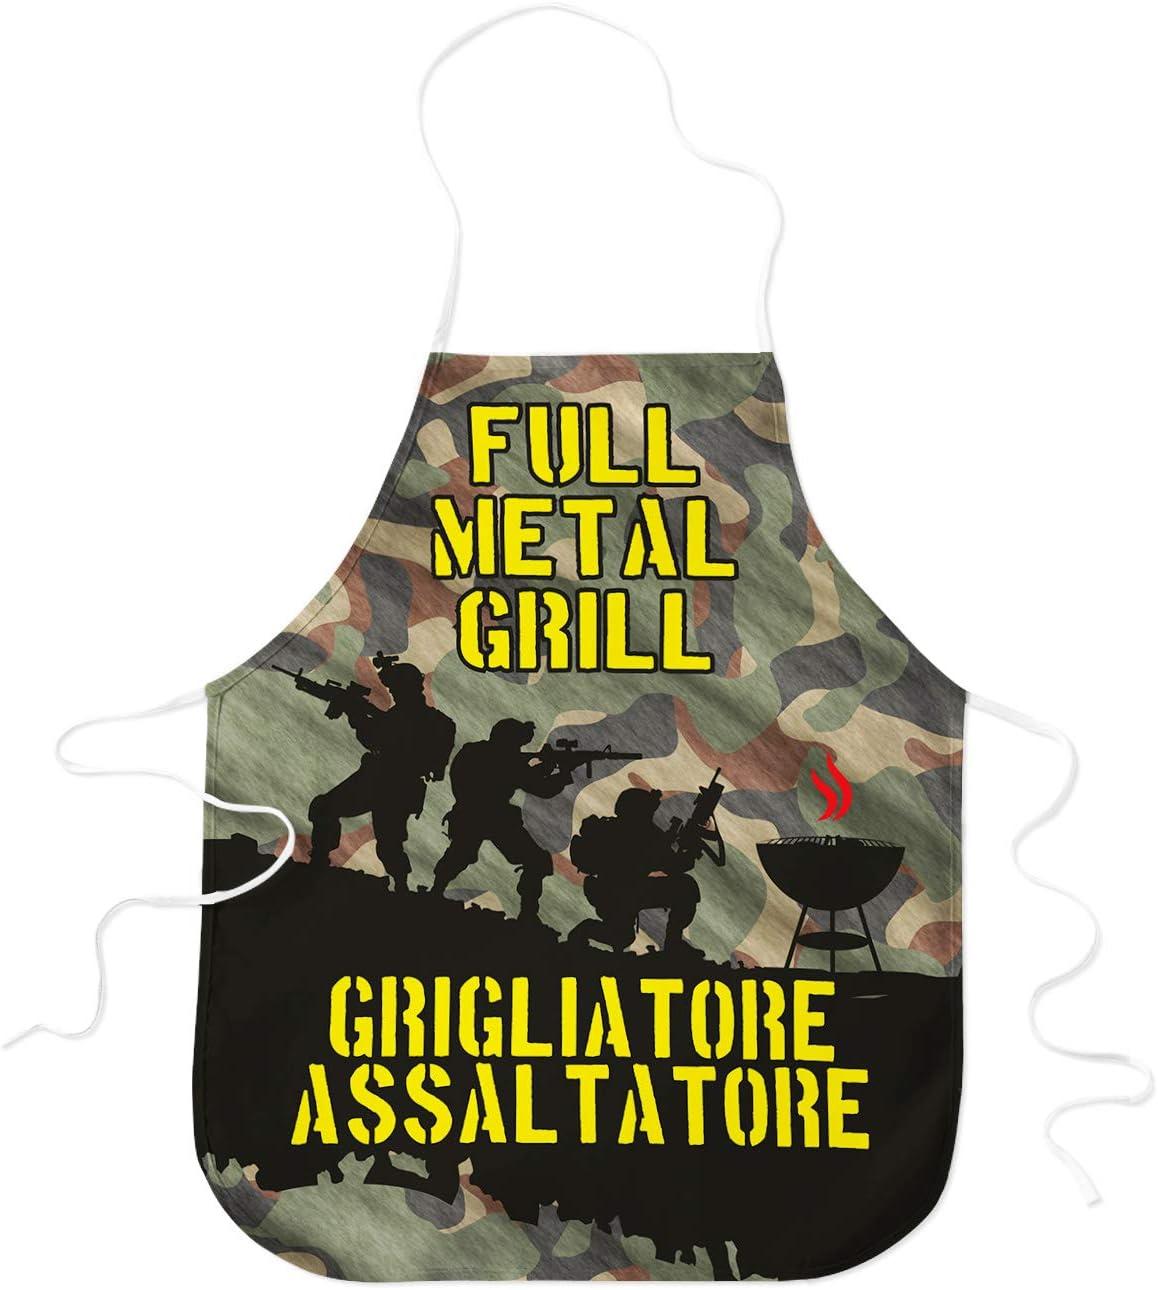 STAMPATEK Grembiule Divertente Barbecue Grigliatore Assaltatore Mimetico Cucina Grigliare Grembiuli Idea Regalo BBQ